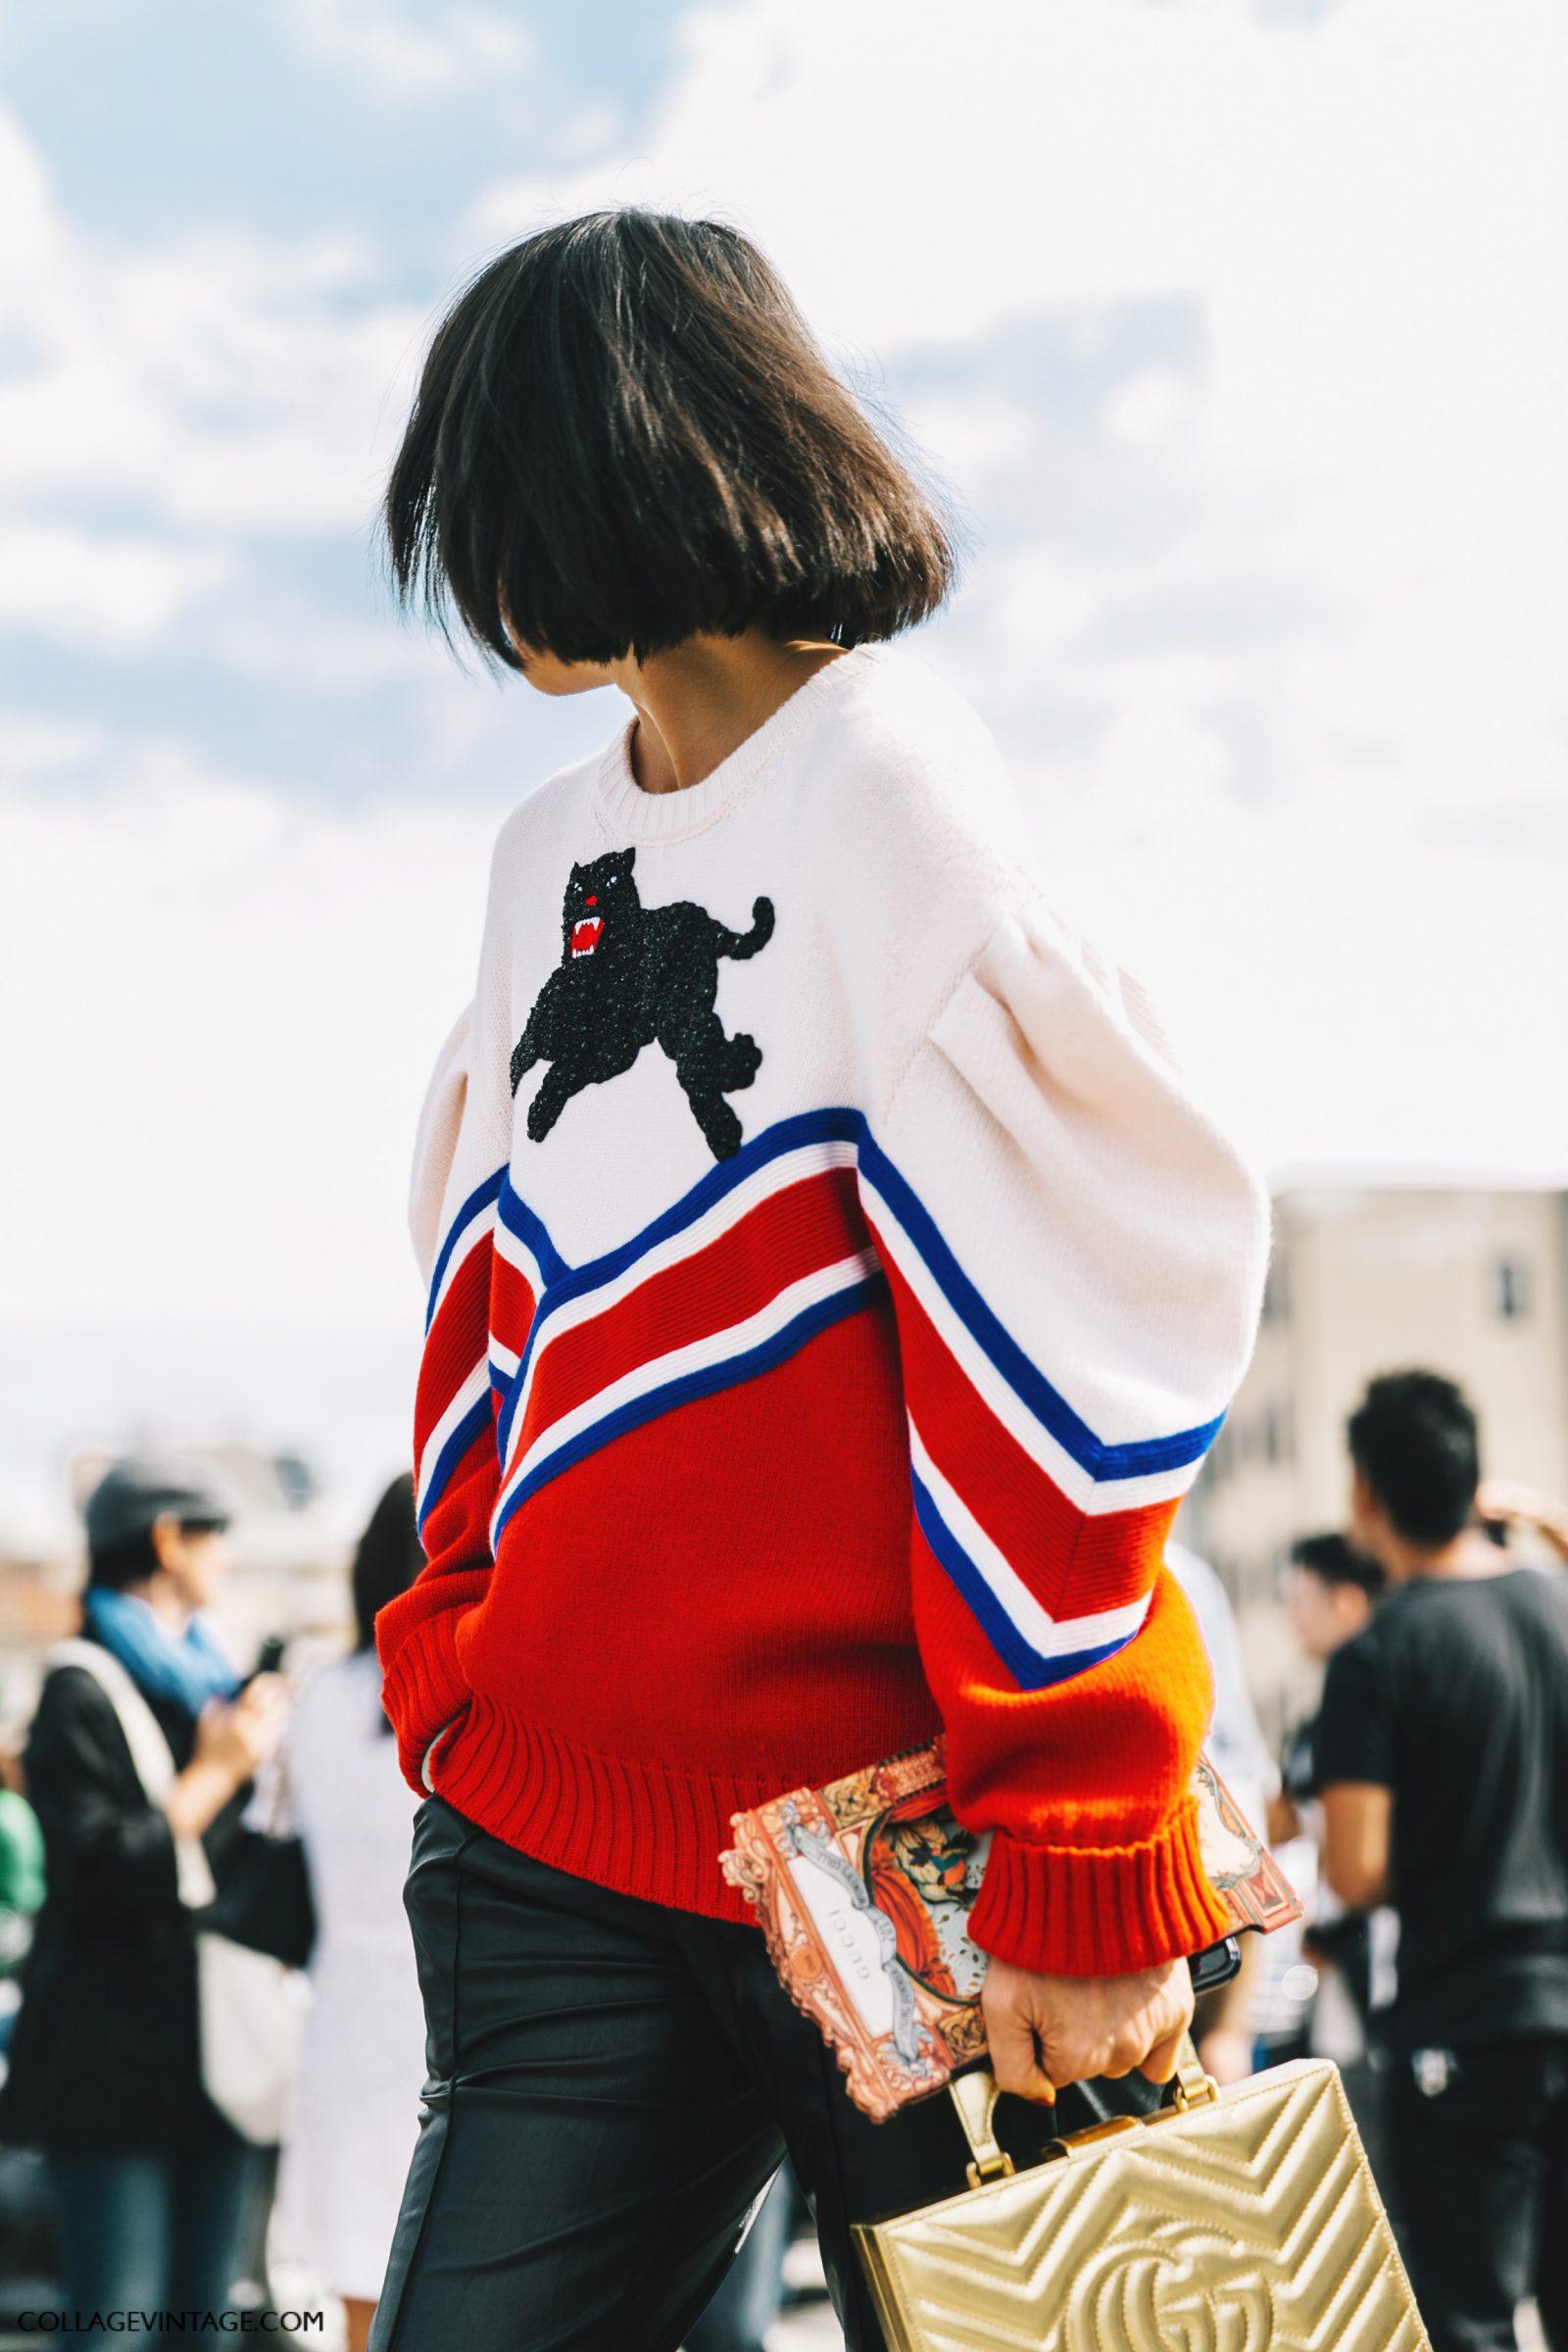 mfw-milan_fashion_week_ss17-street_style-outfits-collage_vintage-gucci-numero_21-alberta_ferreti-75